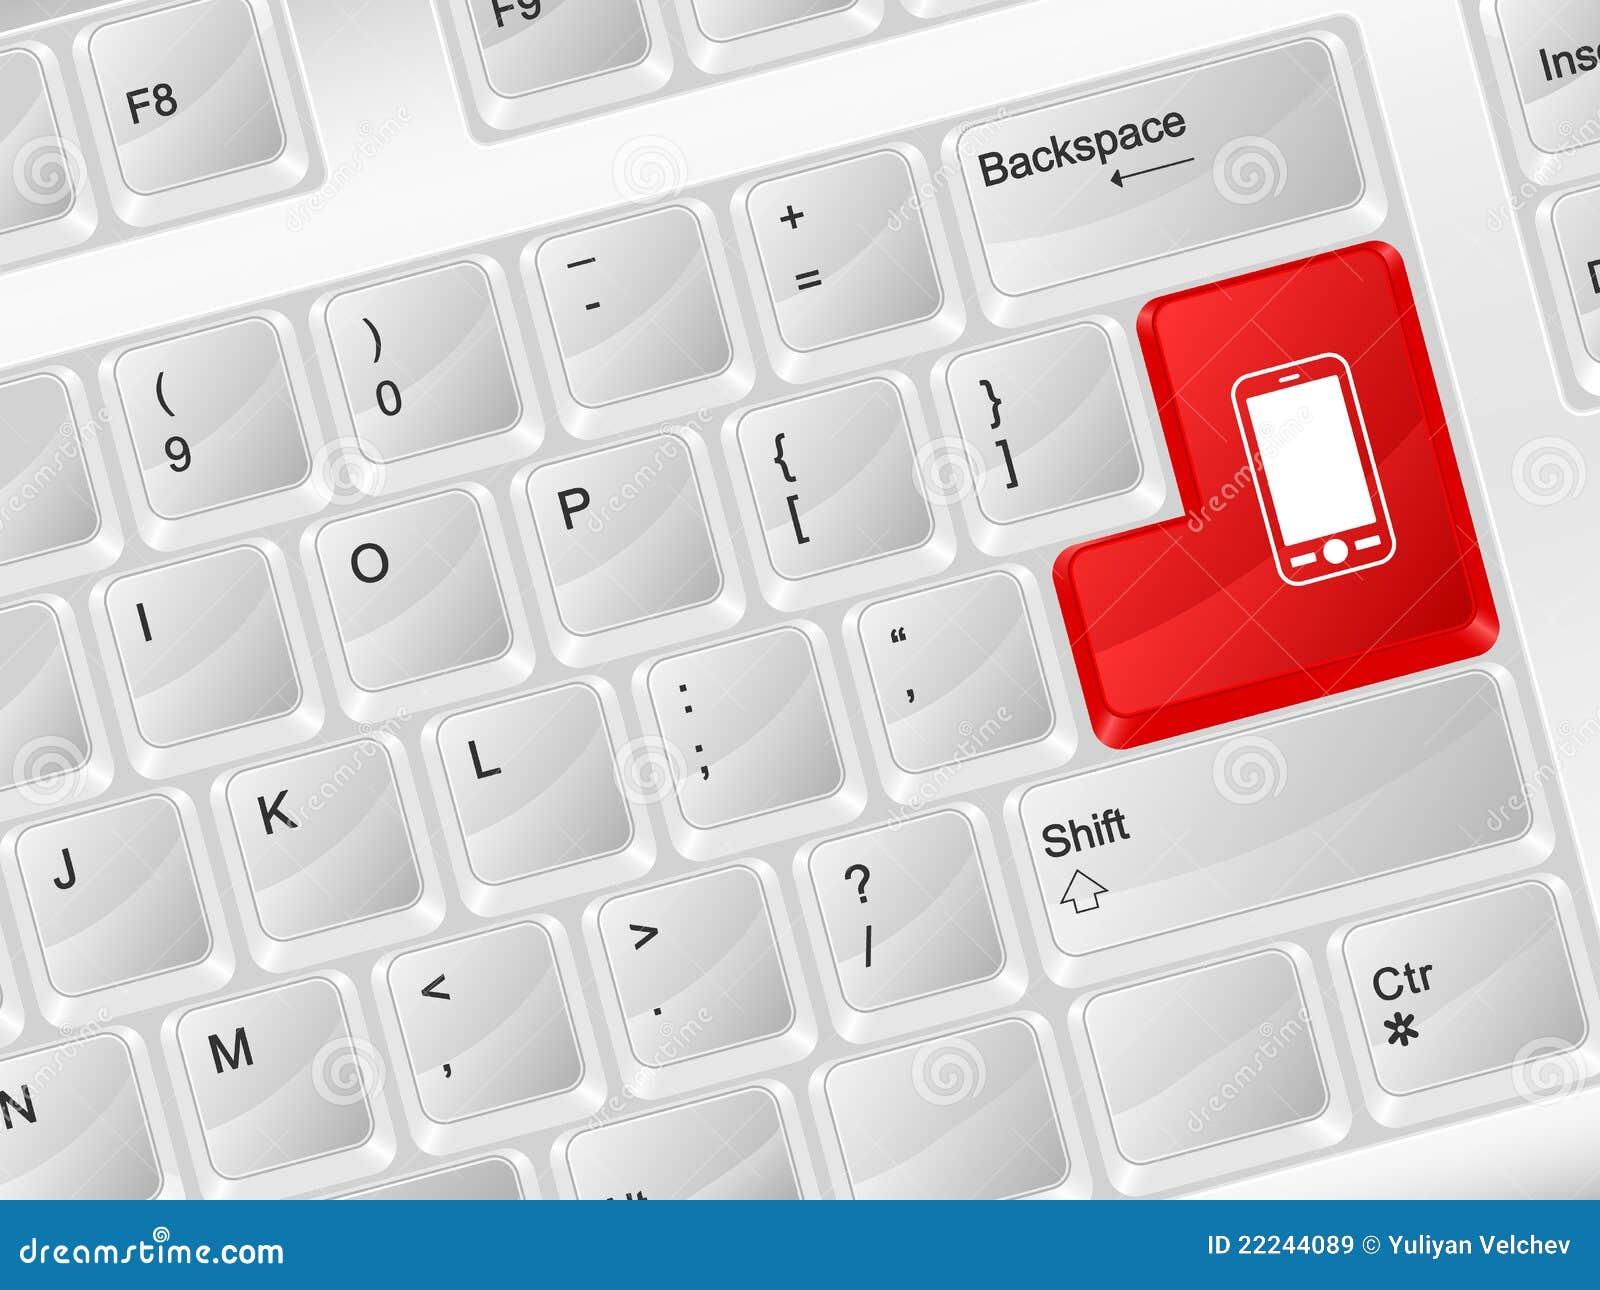 Computer Keyboard Mobile Phone Symbol Stock Vector Illustration Of